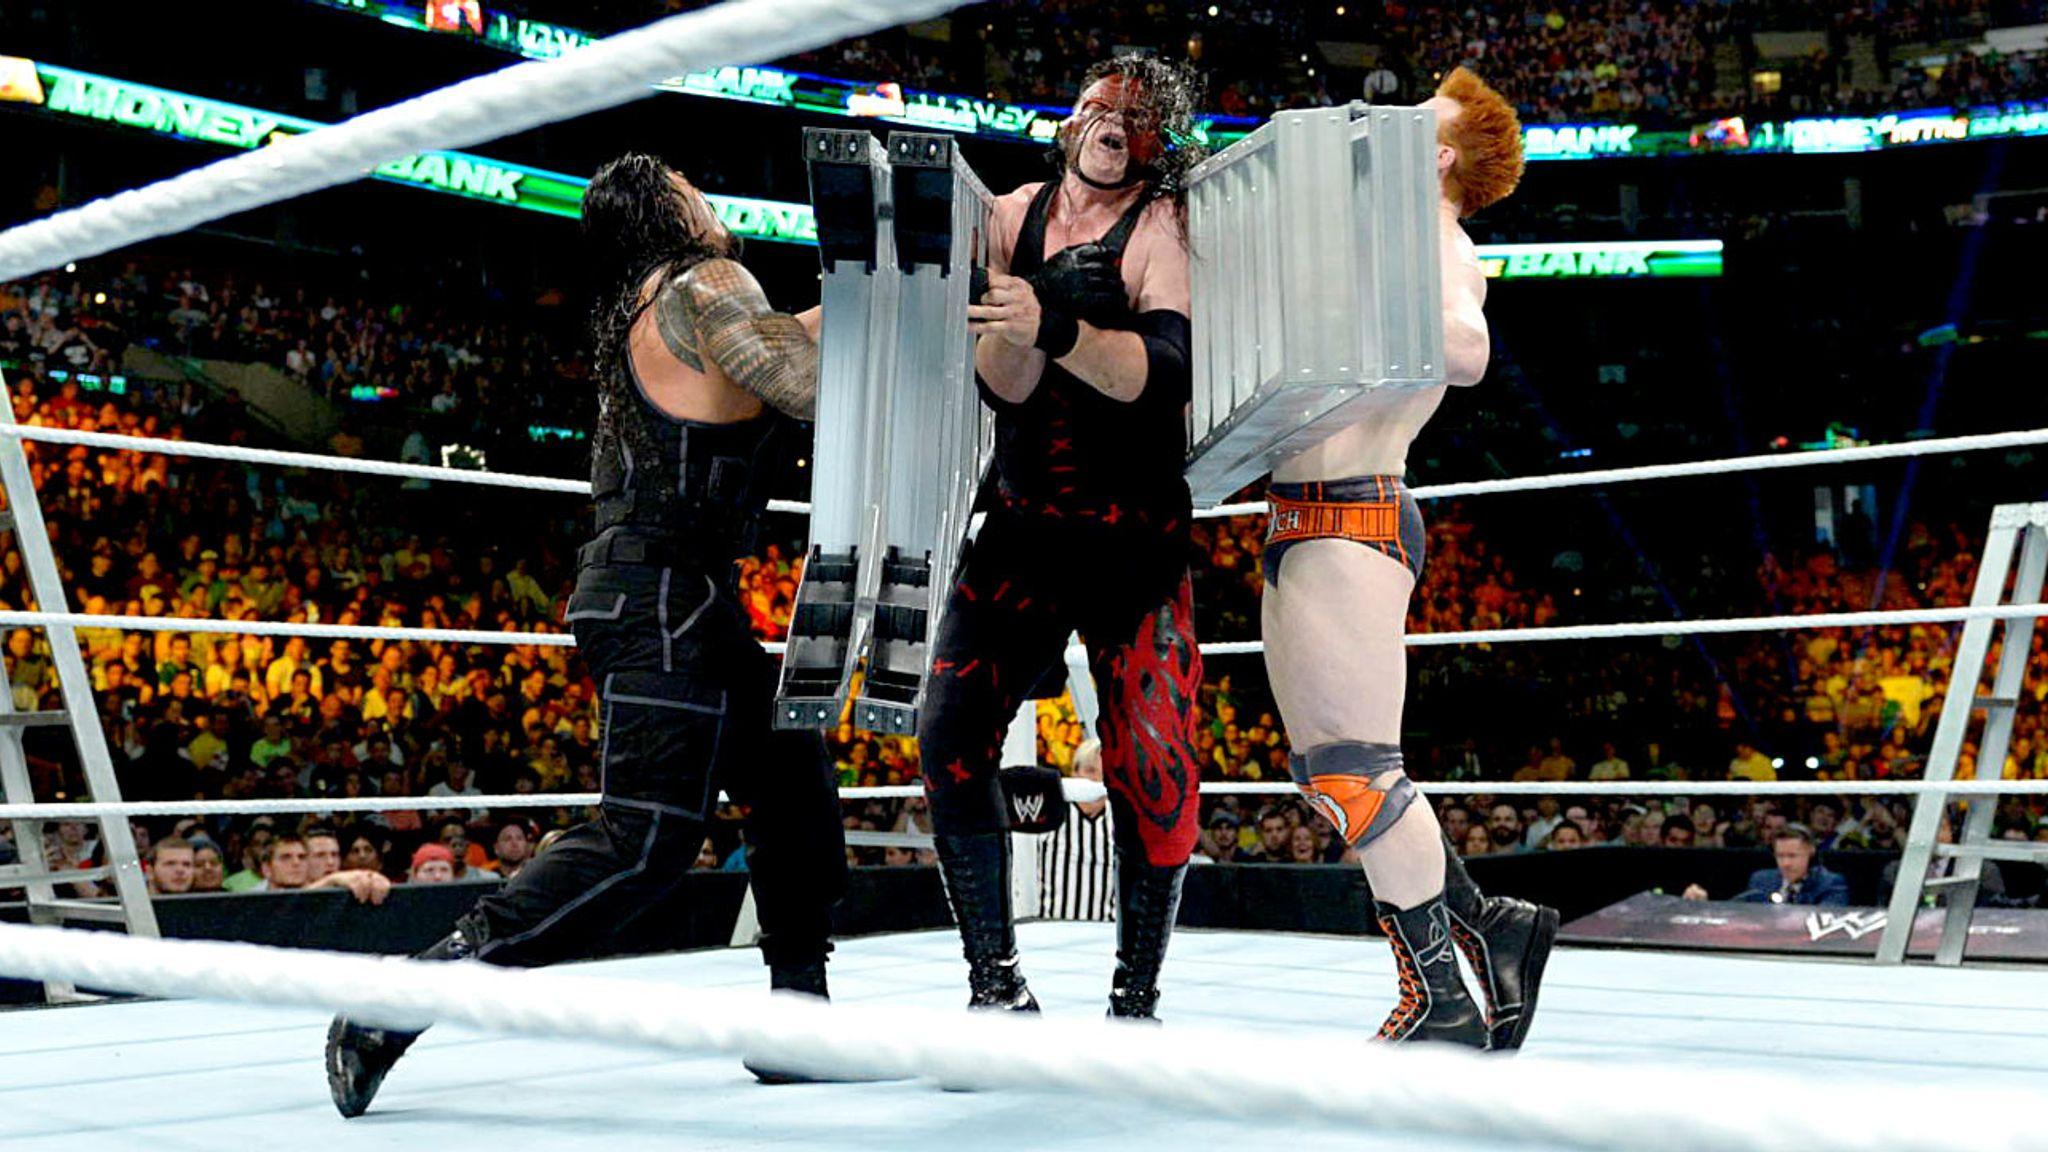 Money In The Bank 2014 John Cena Wins Wwe World Heavyweight Title In Ladder Match Wwe News Sky Sports